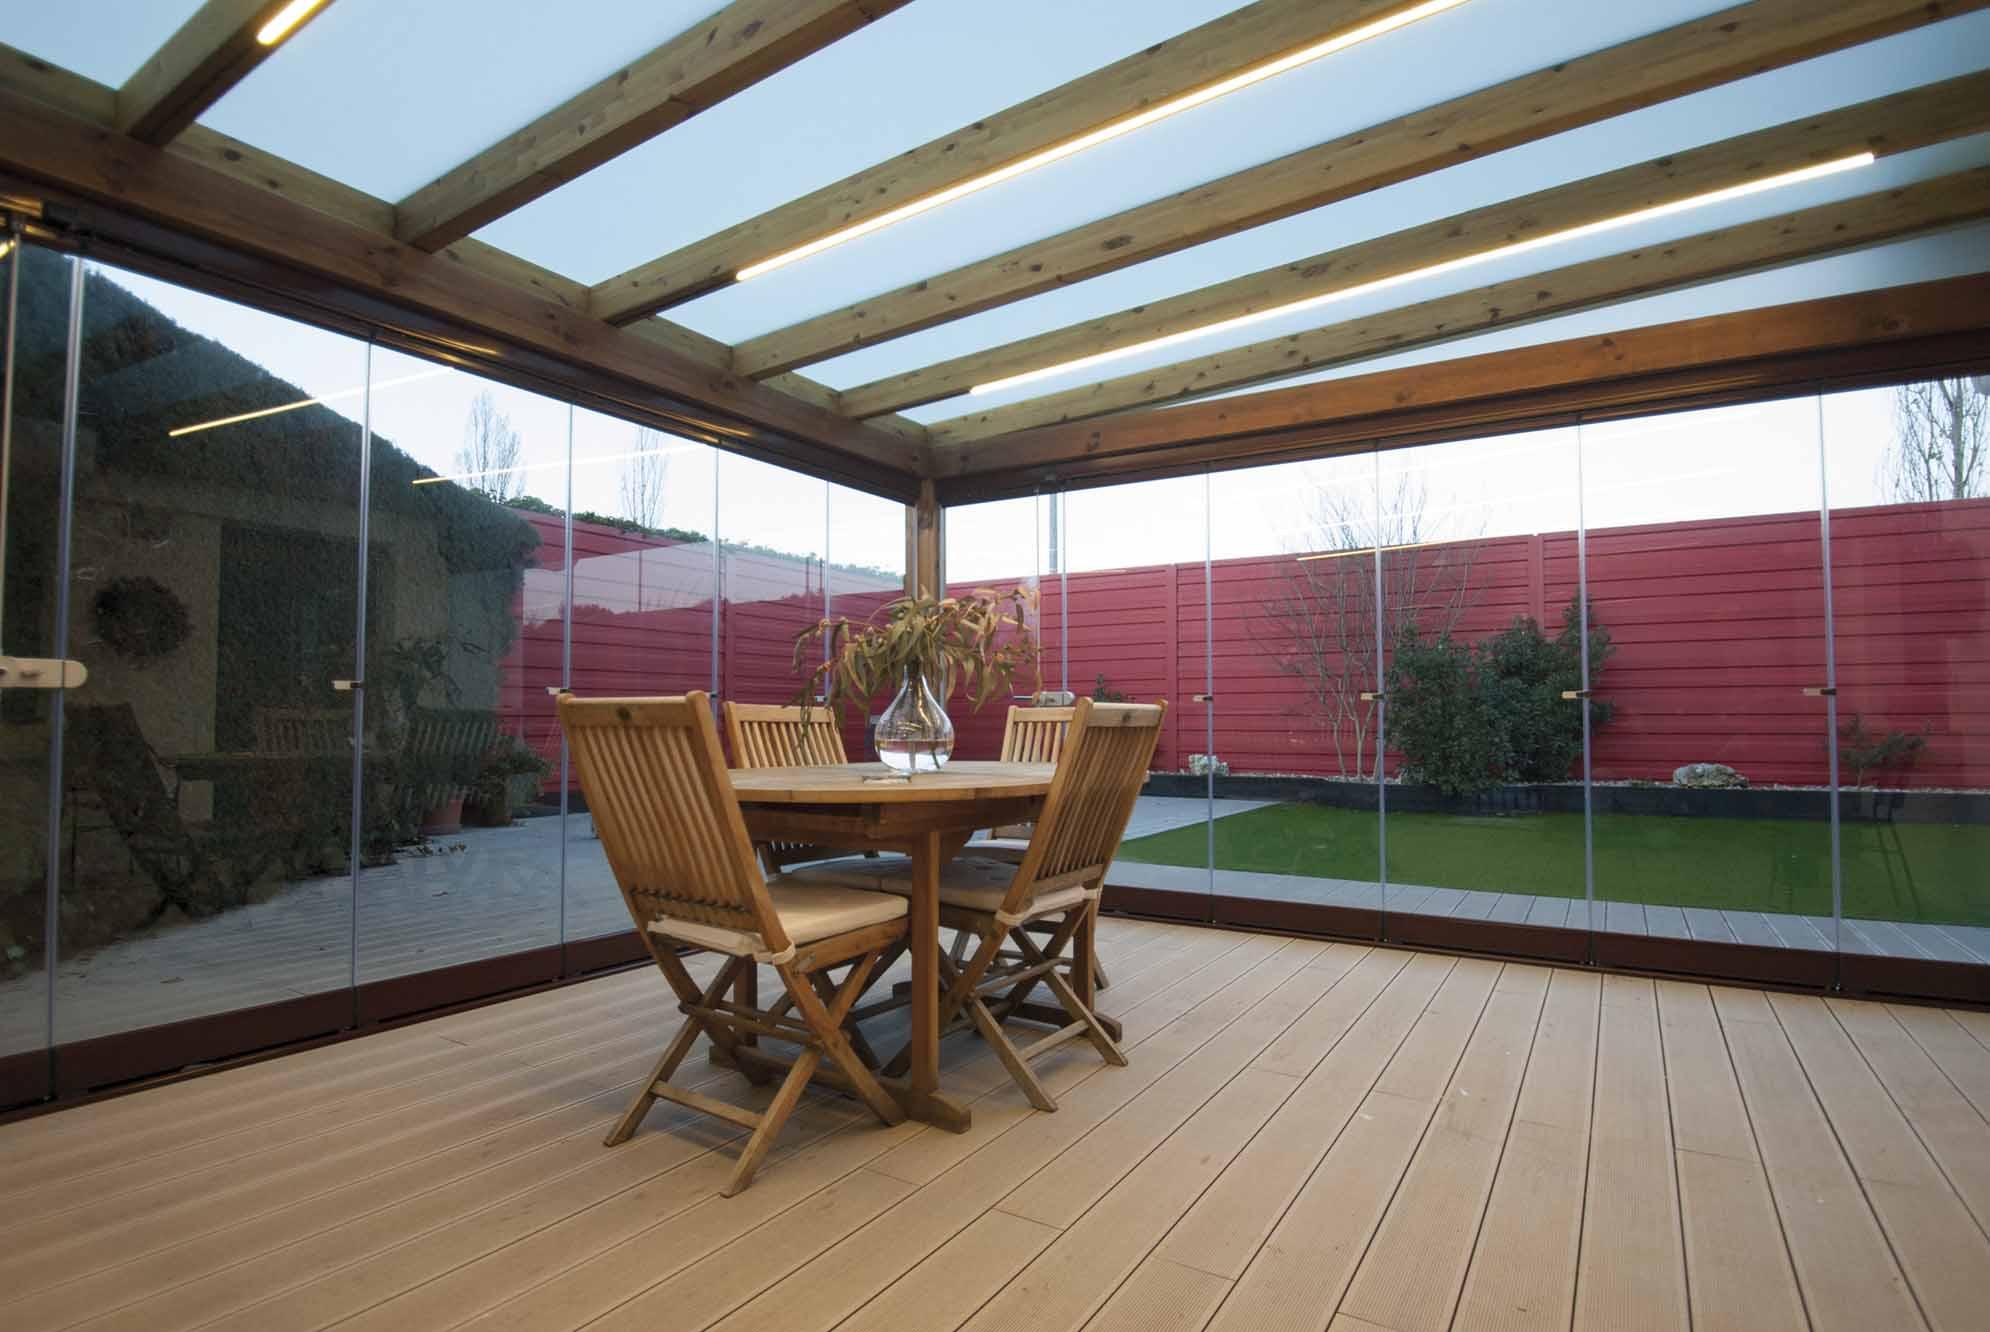 9 cortinas de cristal en porche de madera echarri for Porche jardin madera